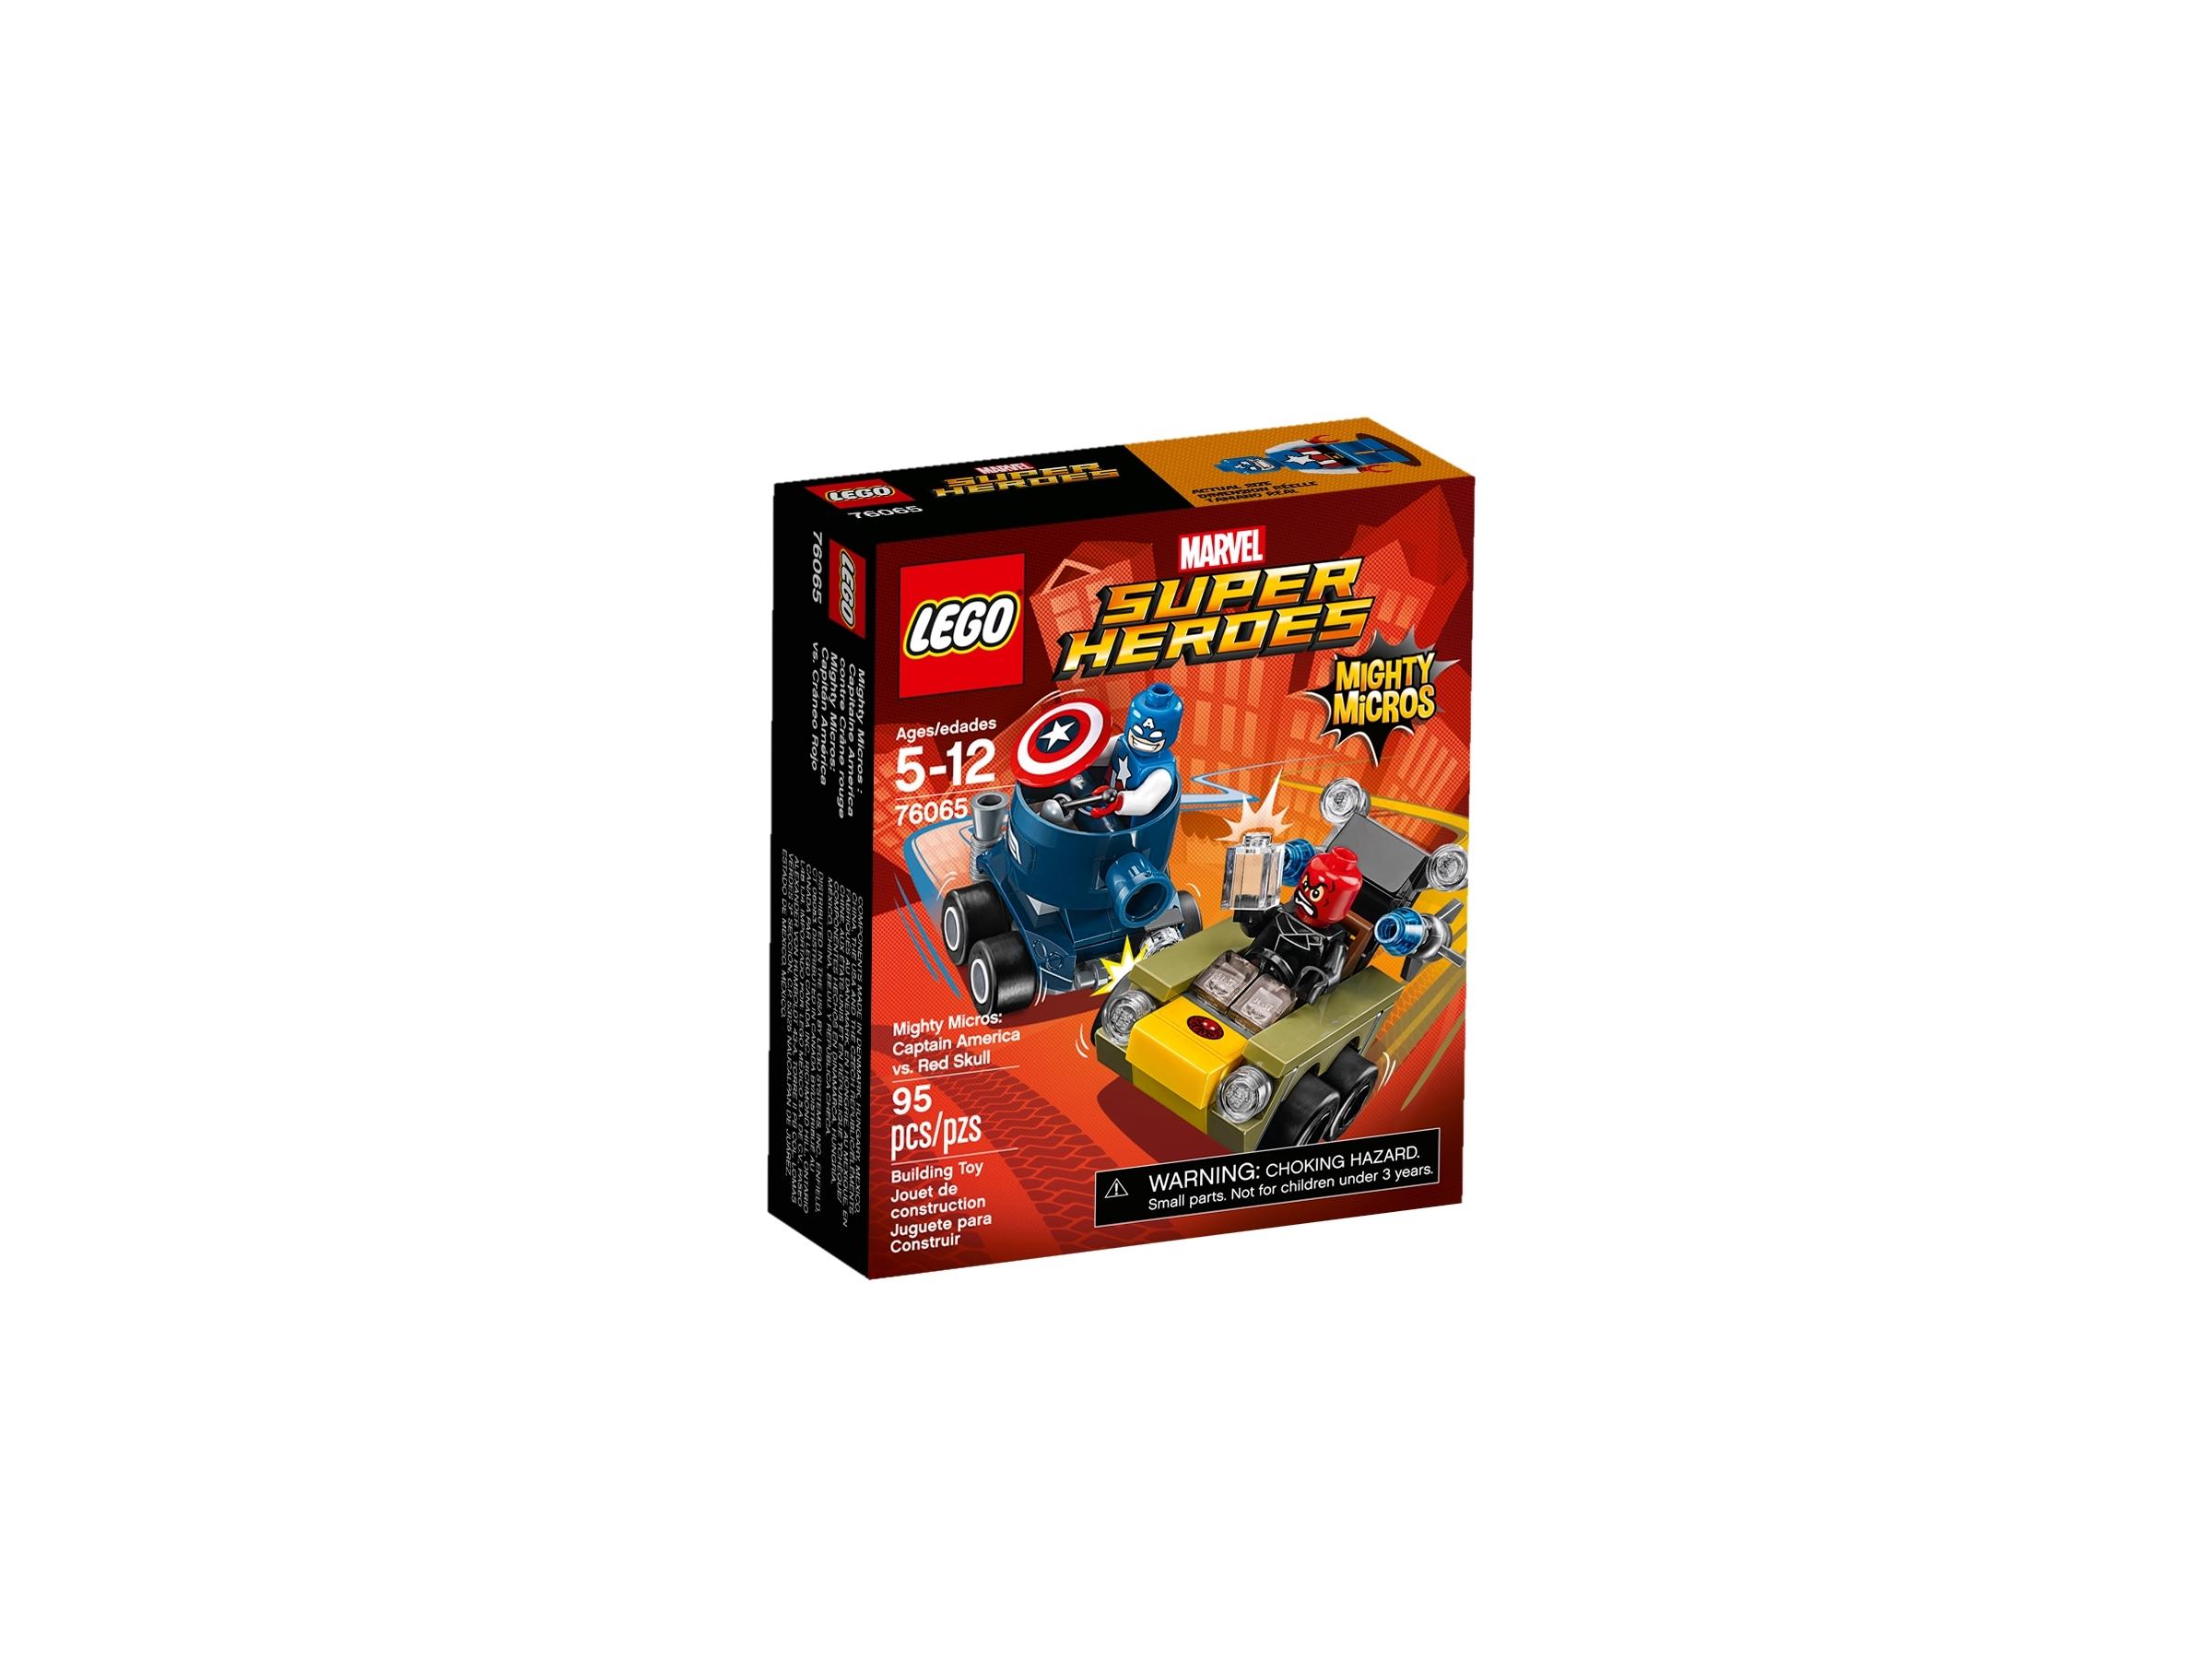 lego 76065 mighty micros captain america mot red skull